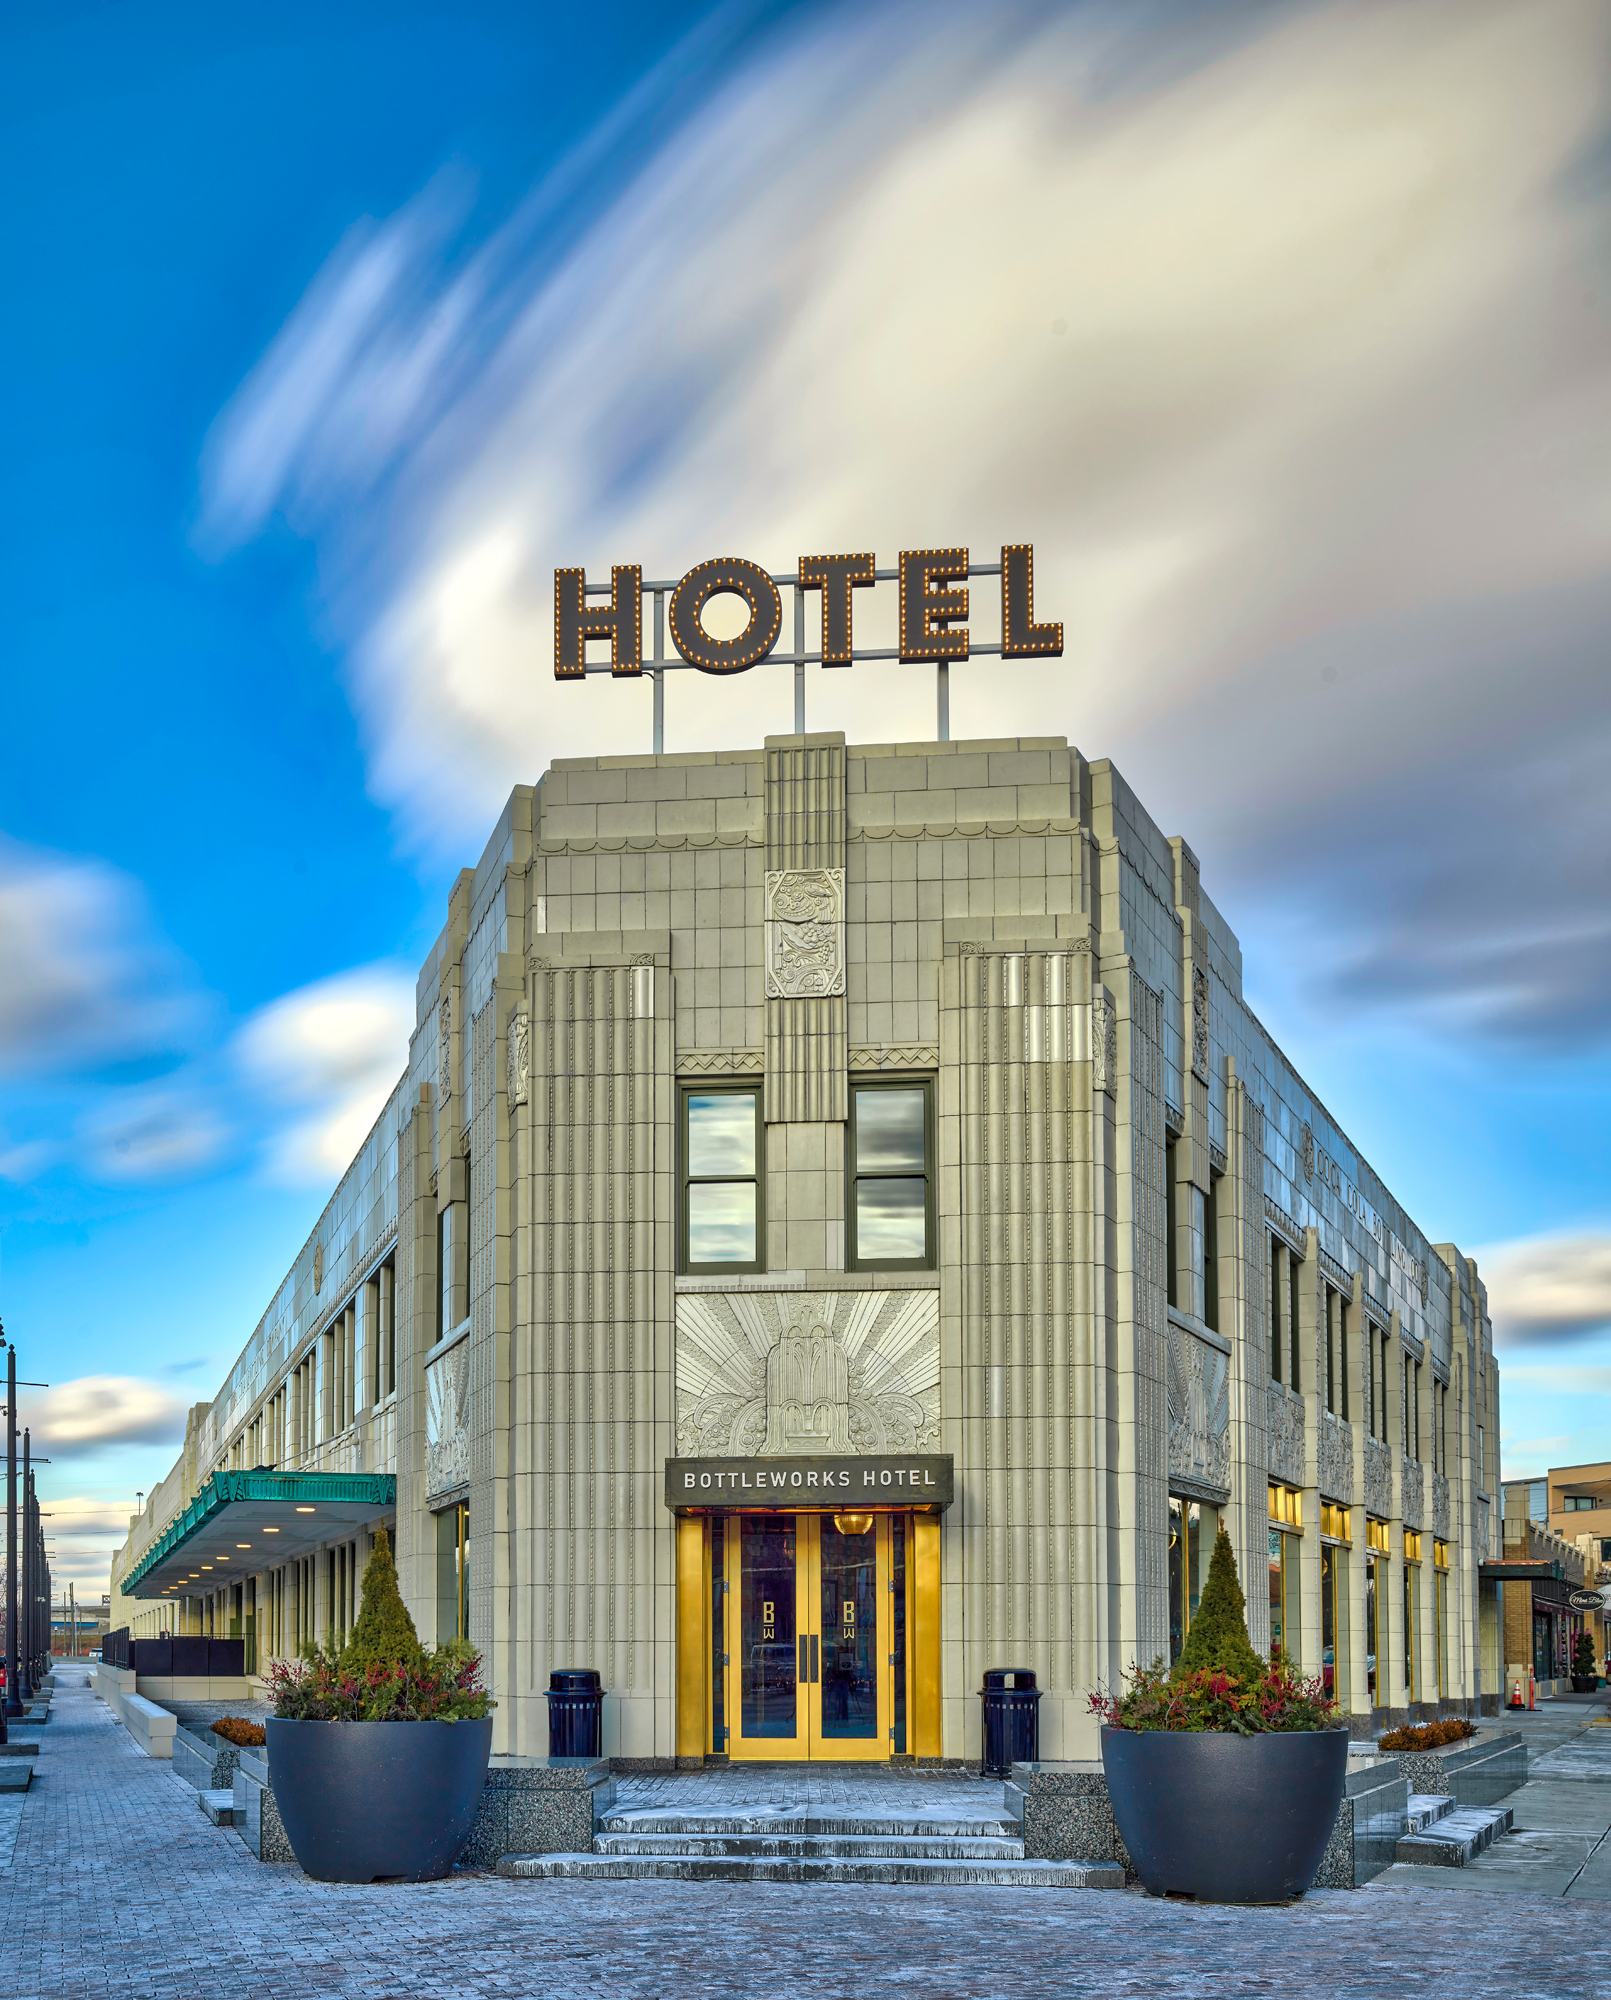 The Bottleworks Hotel shot with Frame Averaging 2 minute exposure